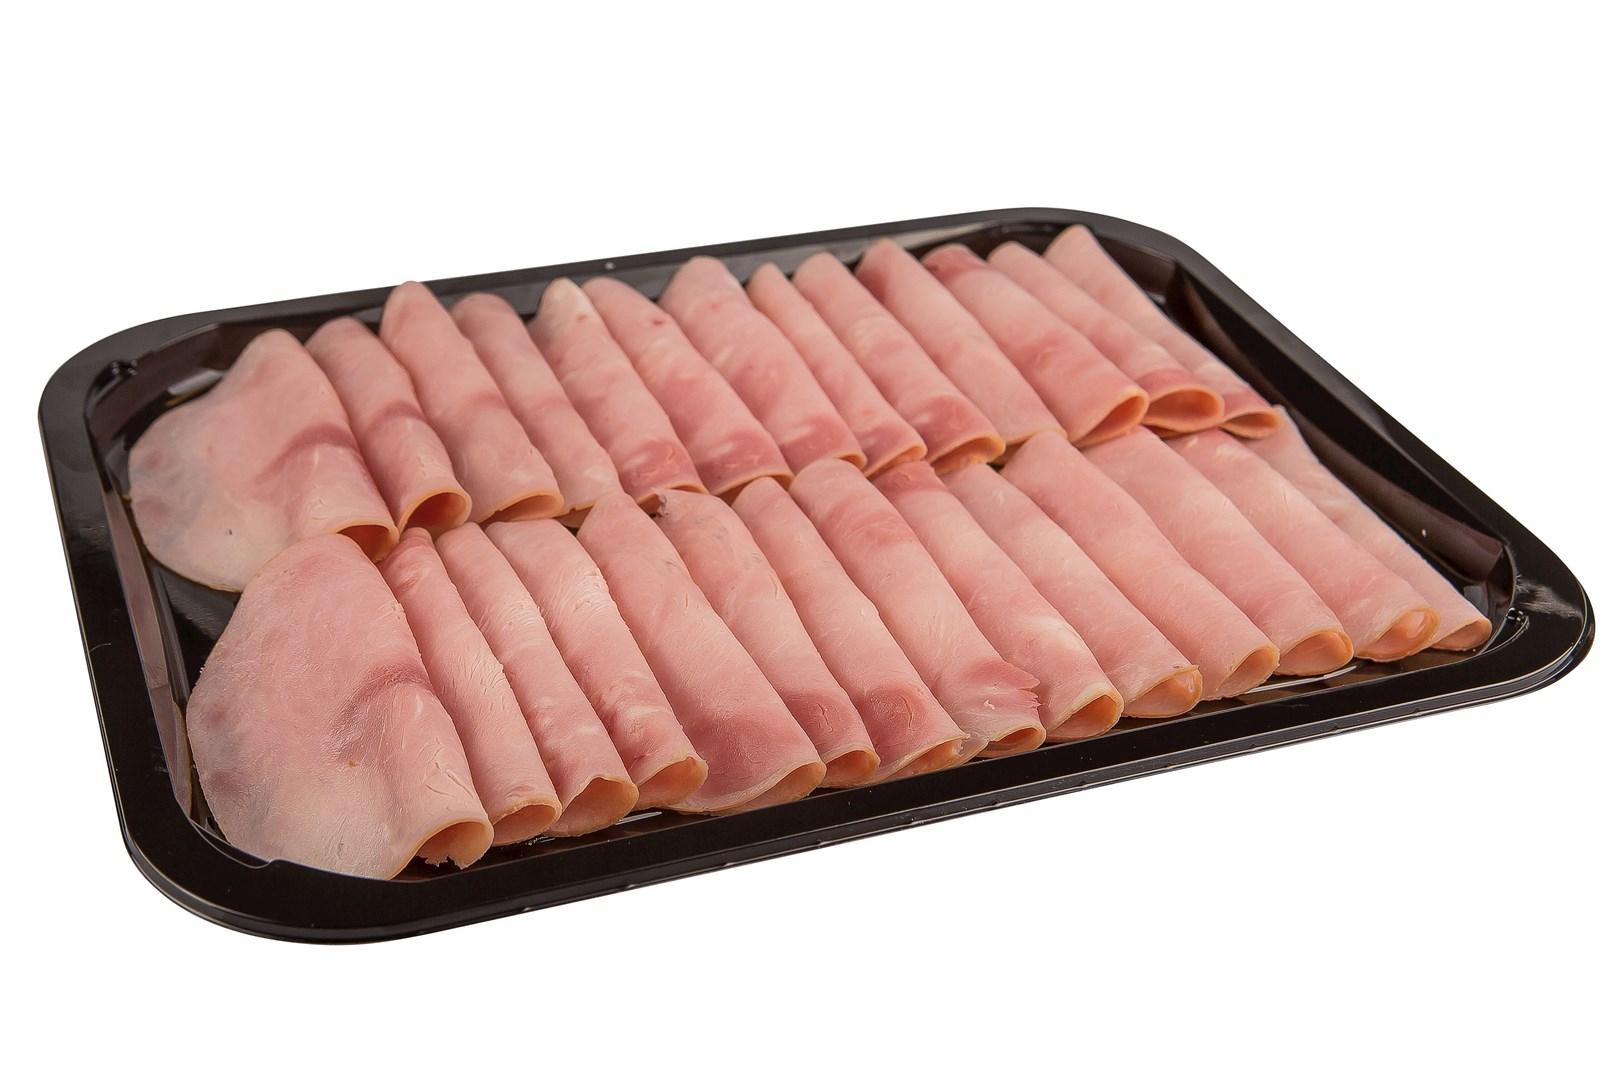 Productafbeelding Ham dubbelgev 30plaks BLK* V